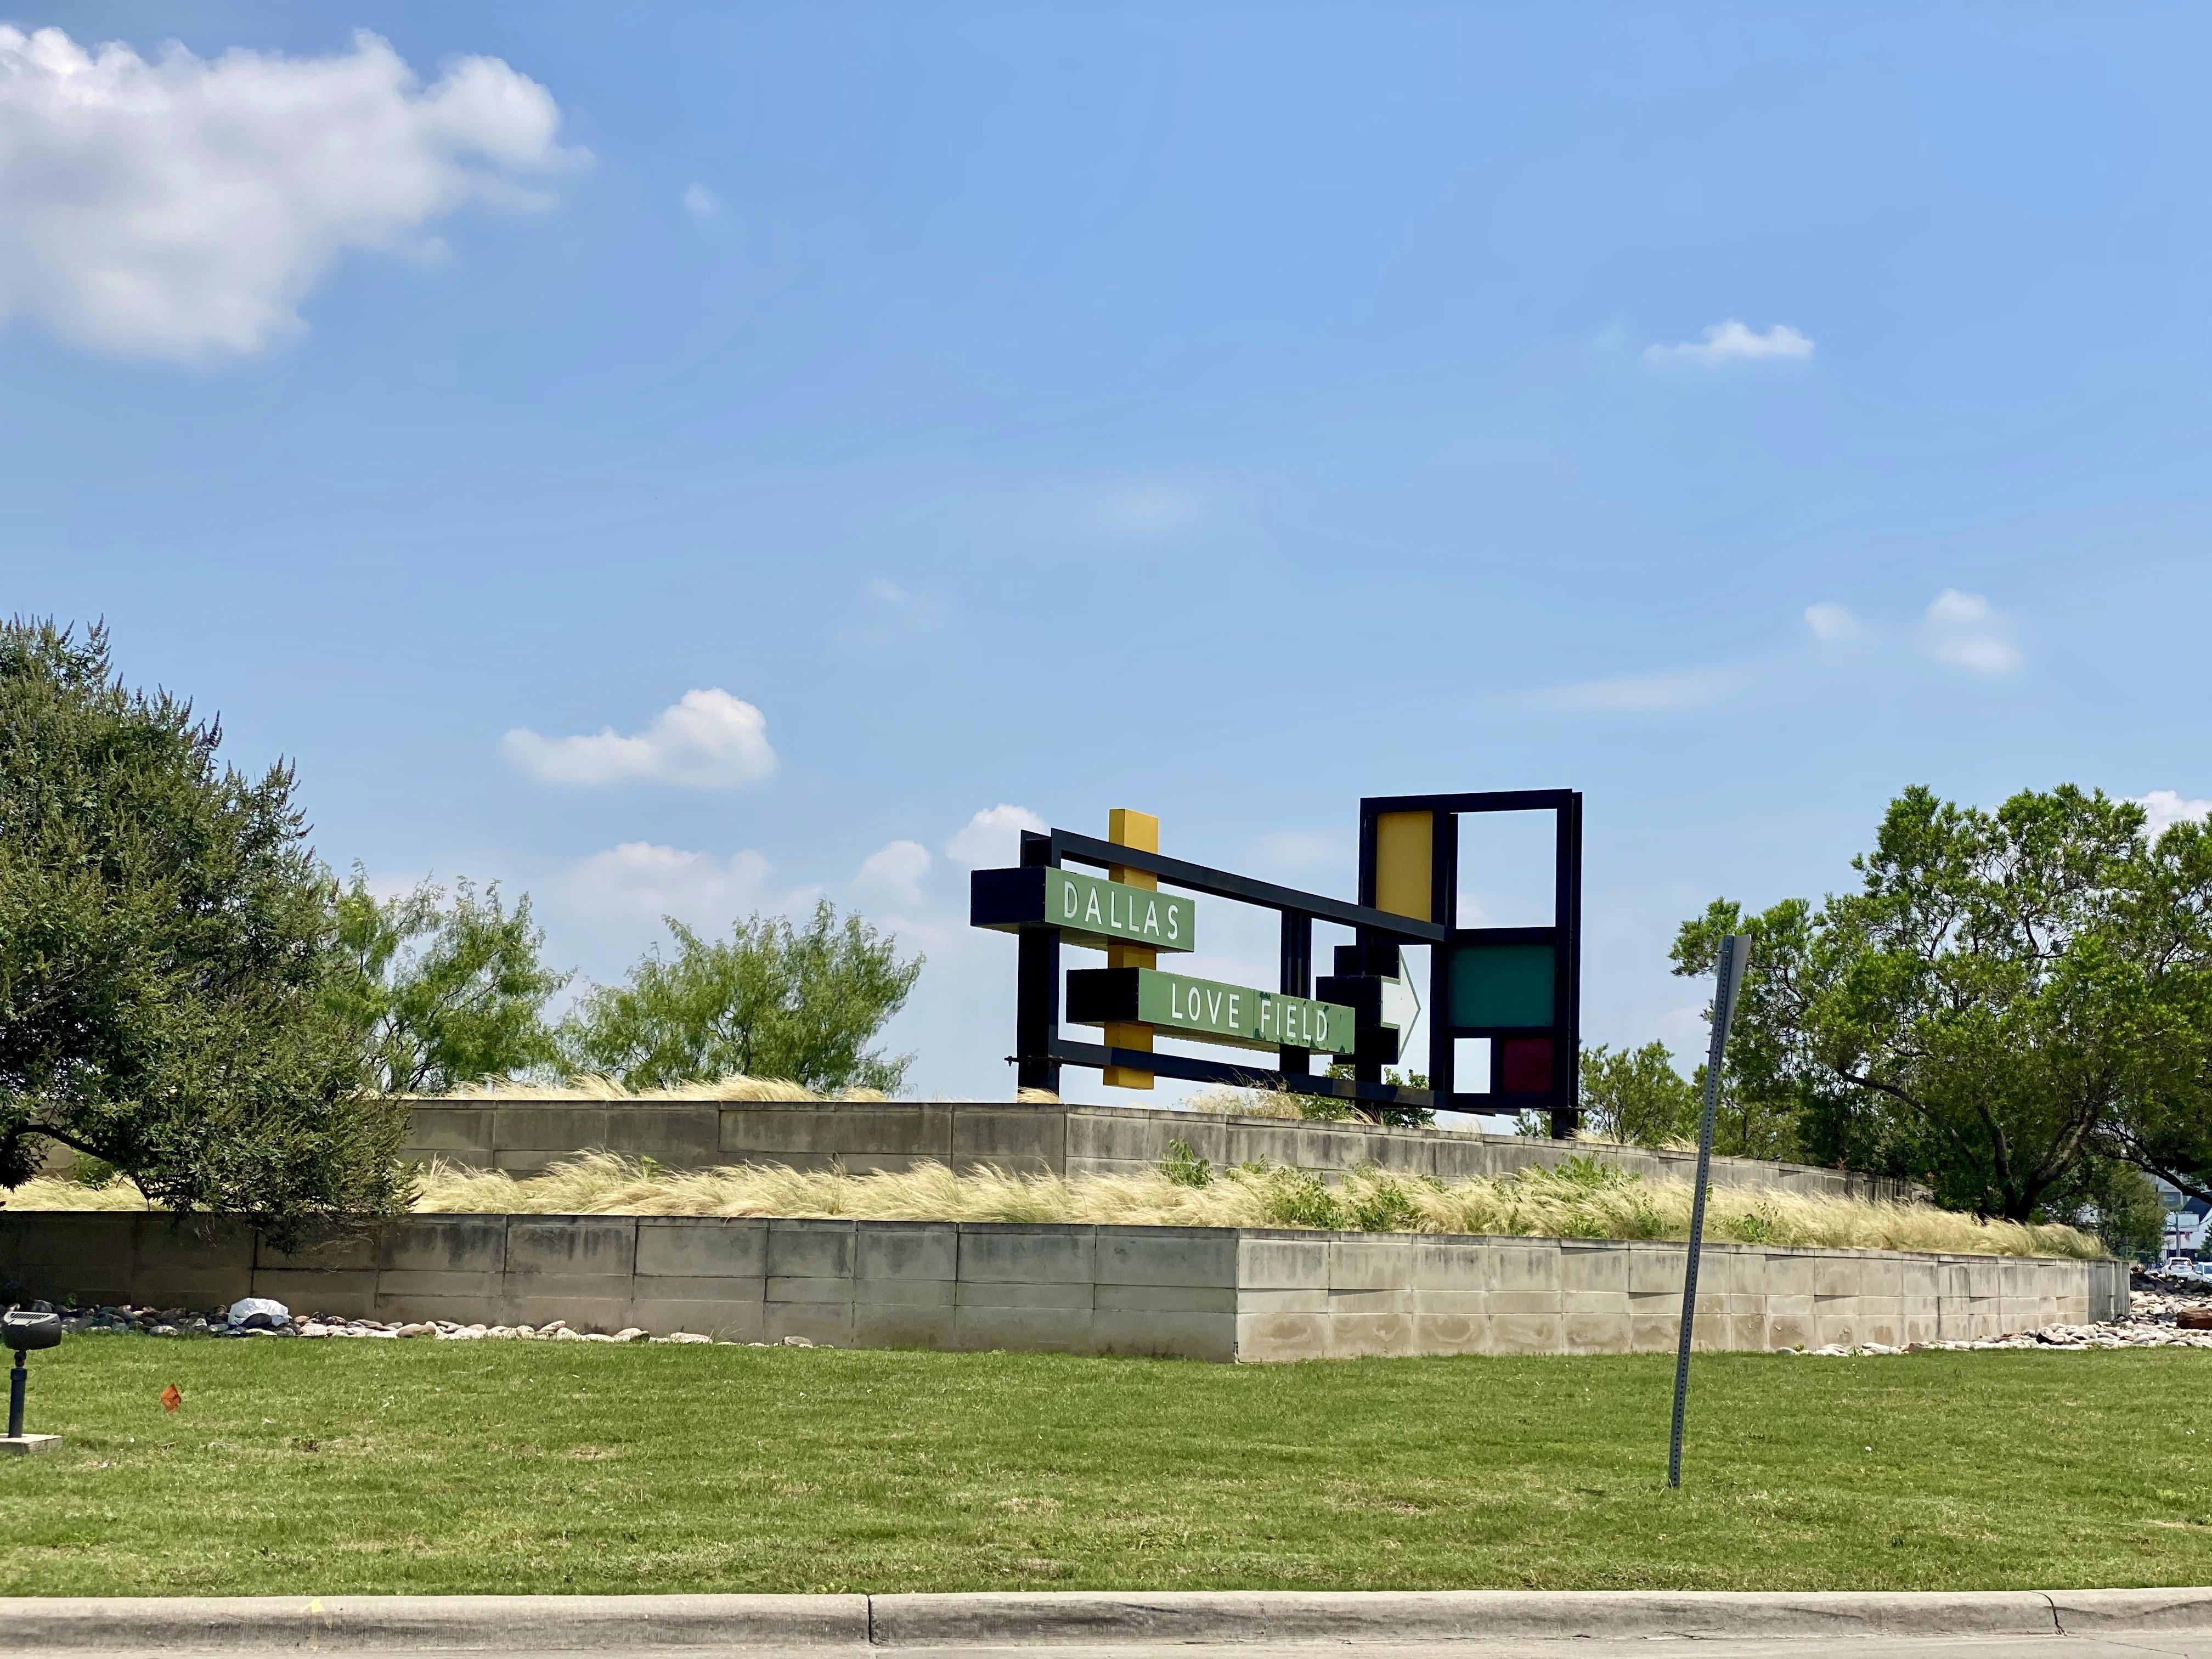 Sign for Love Field, Northwest Dallas